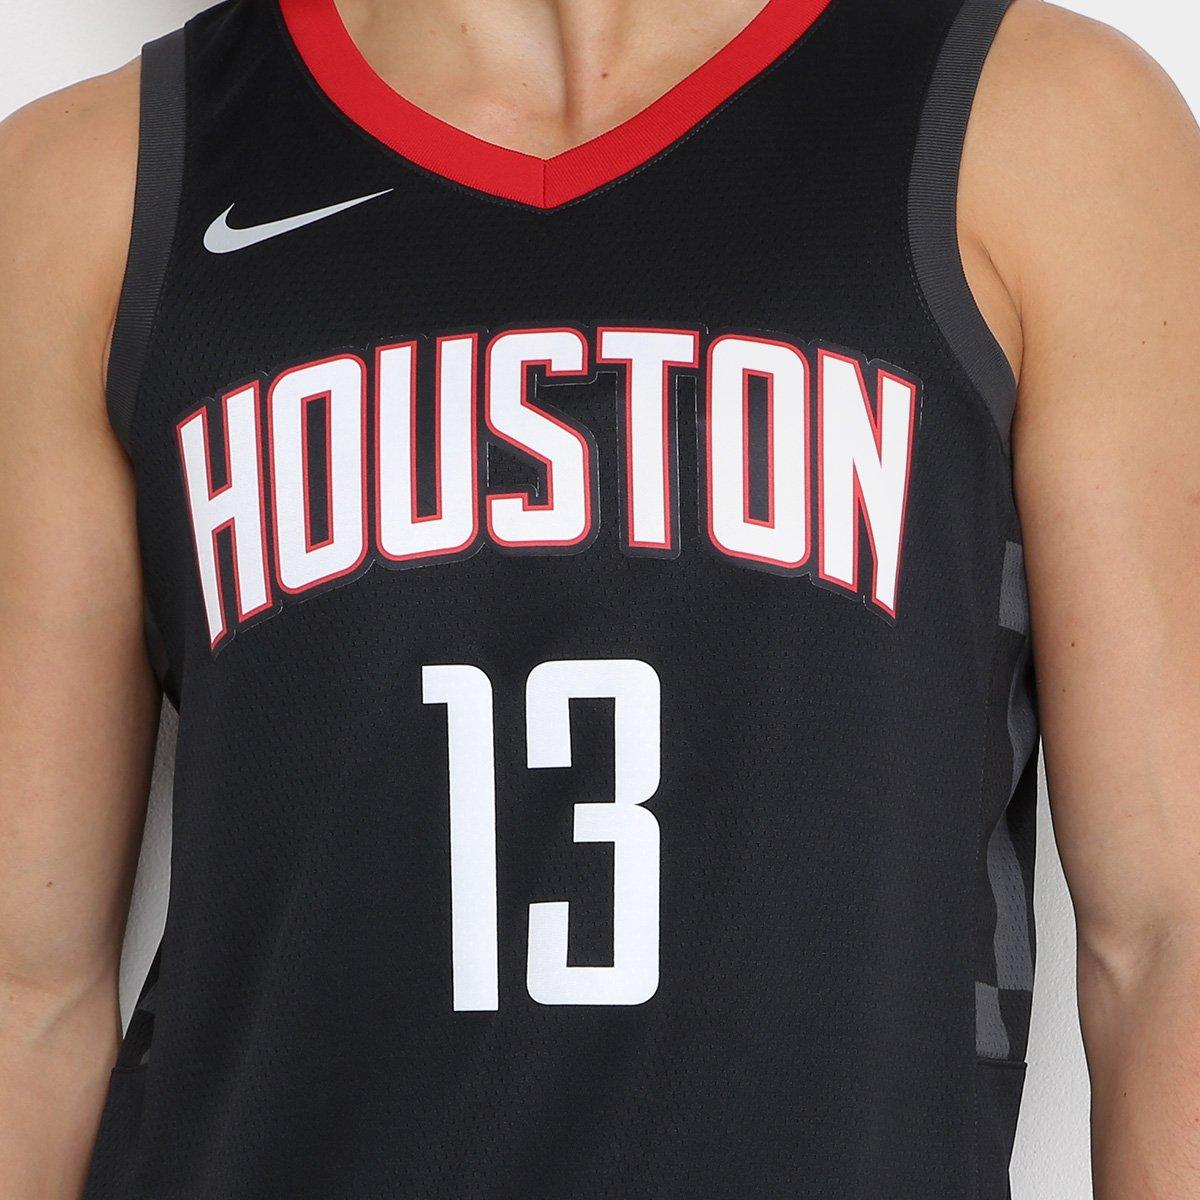 Regata Swingman NBA Houston Rockets Nike - James Harden - Preto e Vermelho a4b487560